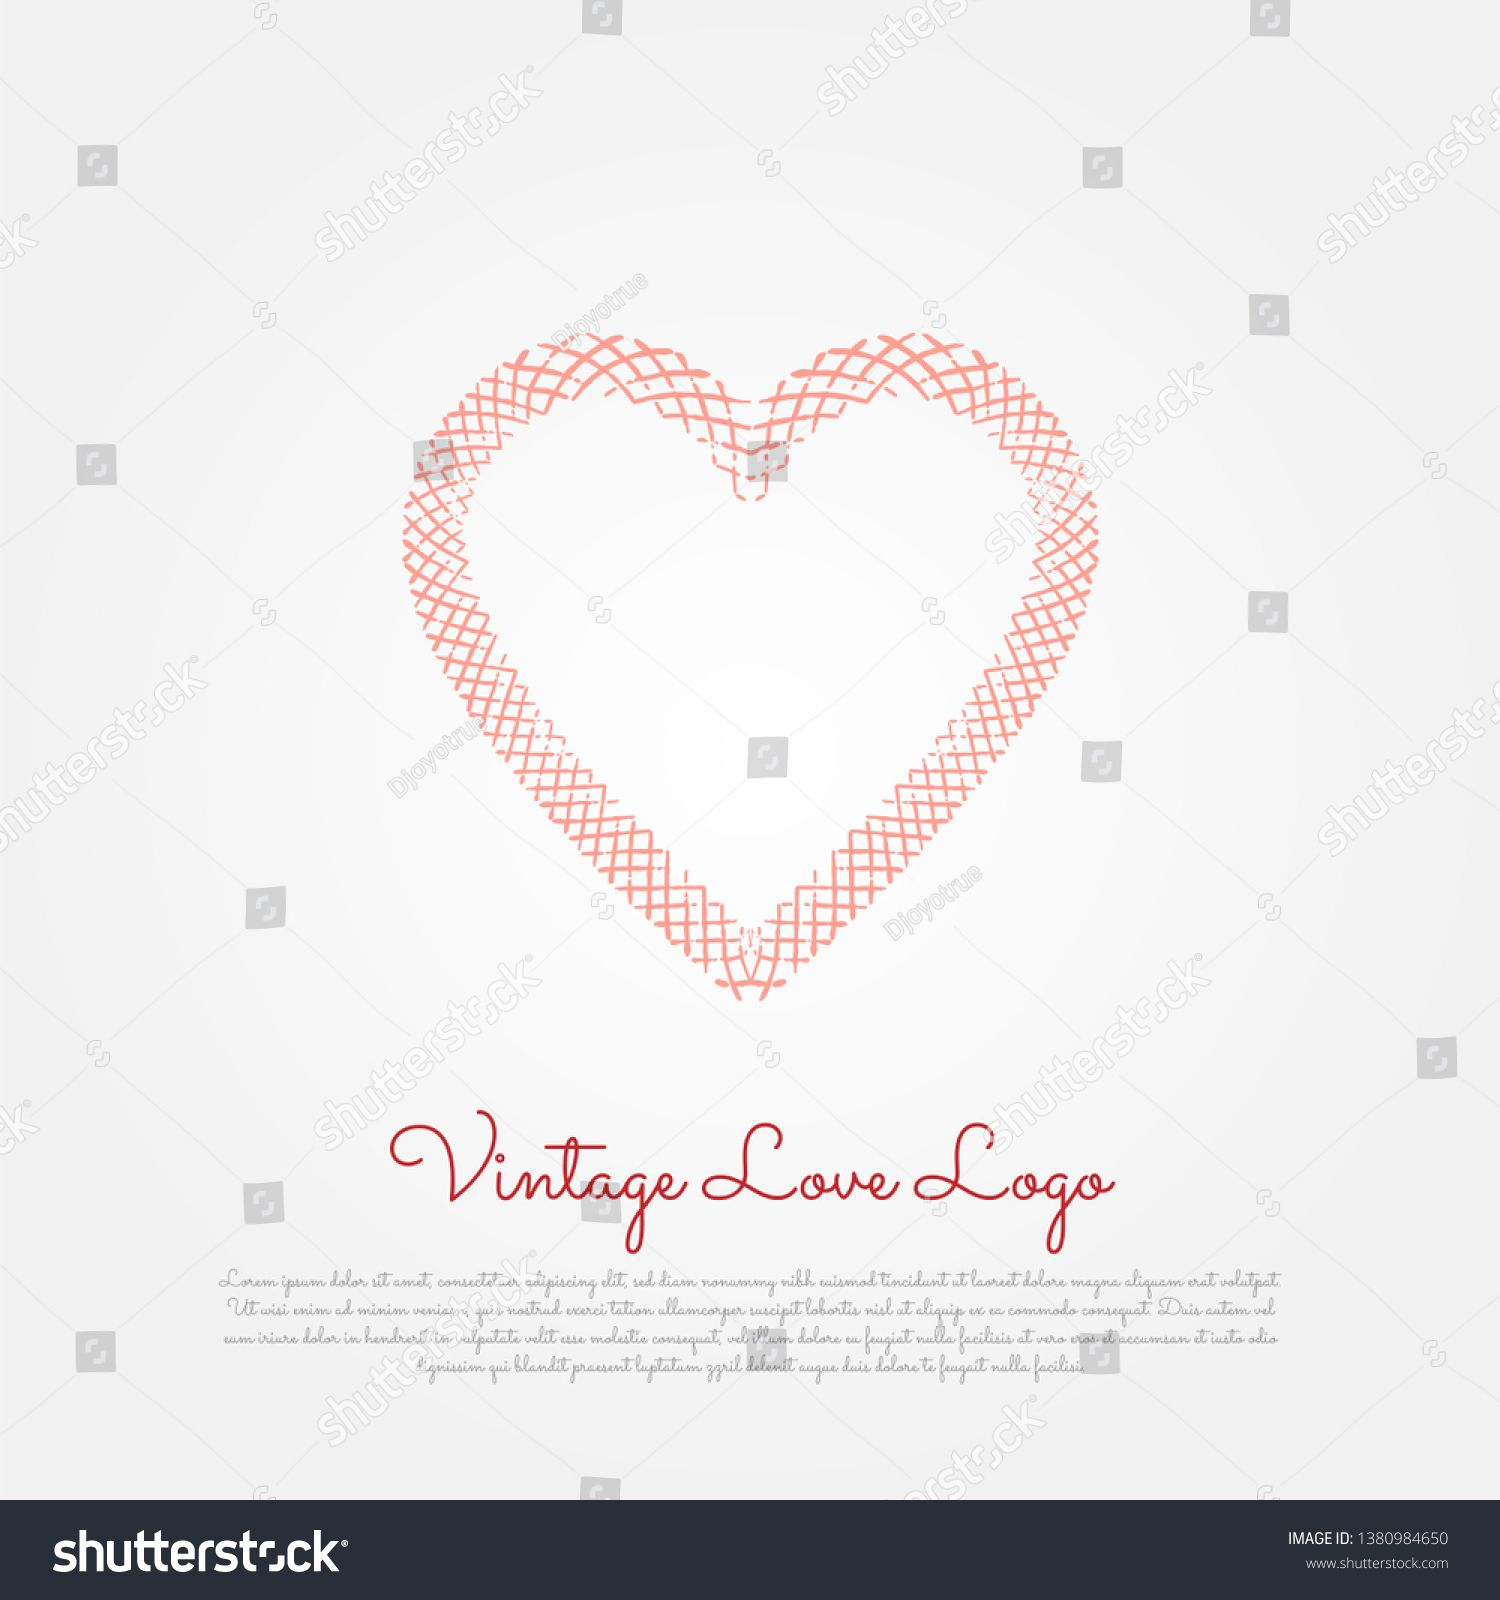 Vintage Love Logo Heart Icon Vintage Style Classic Love Icon Valentine S Day Icon Sponsored Affiliate Heart Icon Lo In 2020 Love Logo Heart Icons Vintage Love